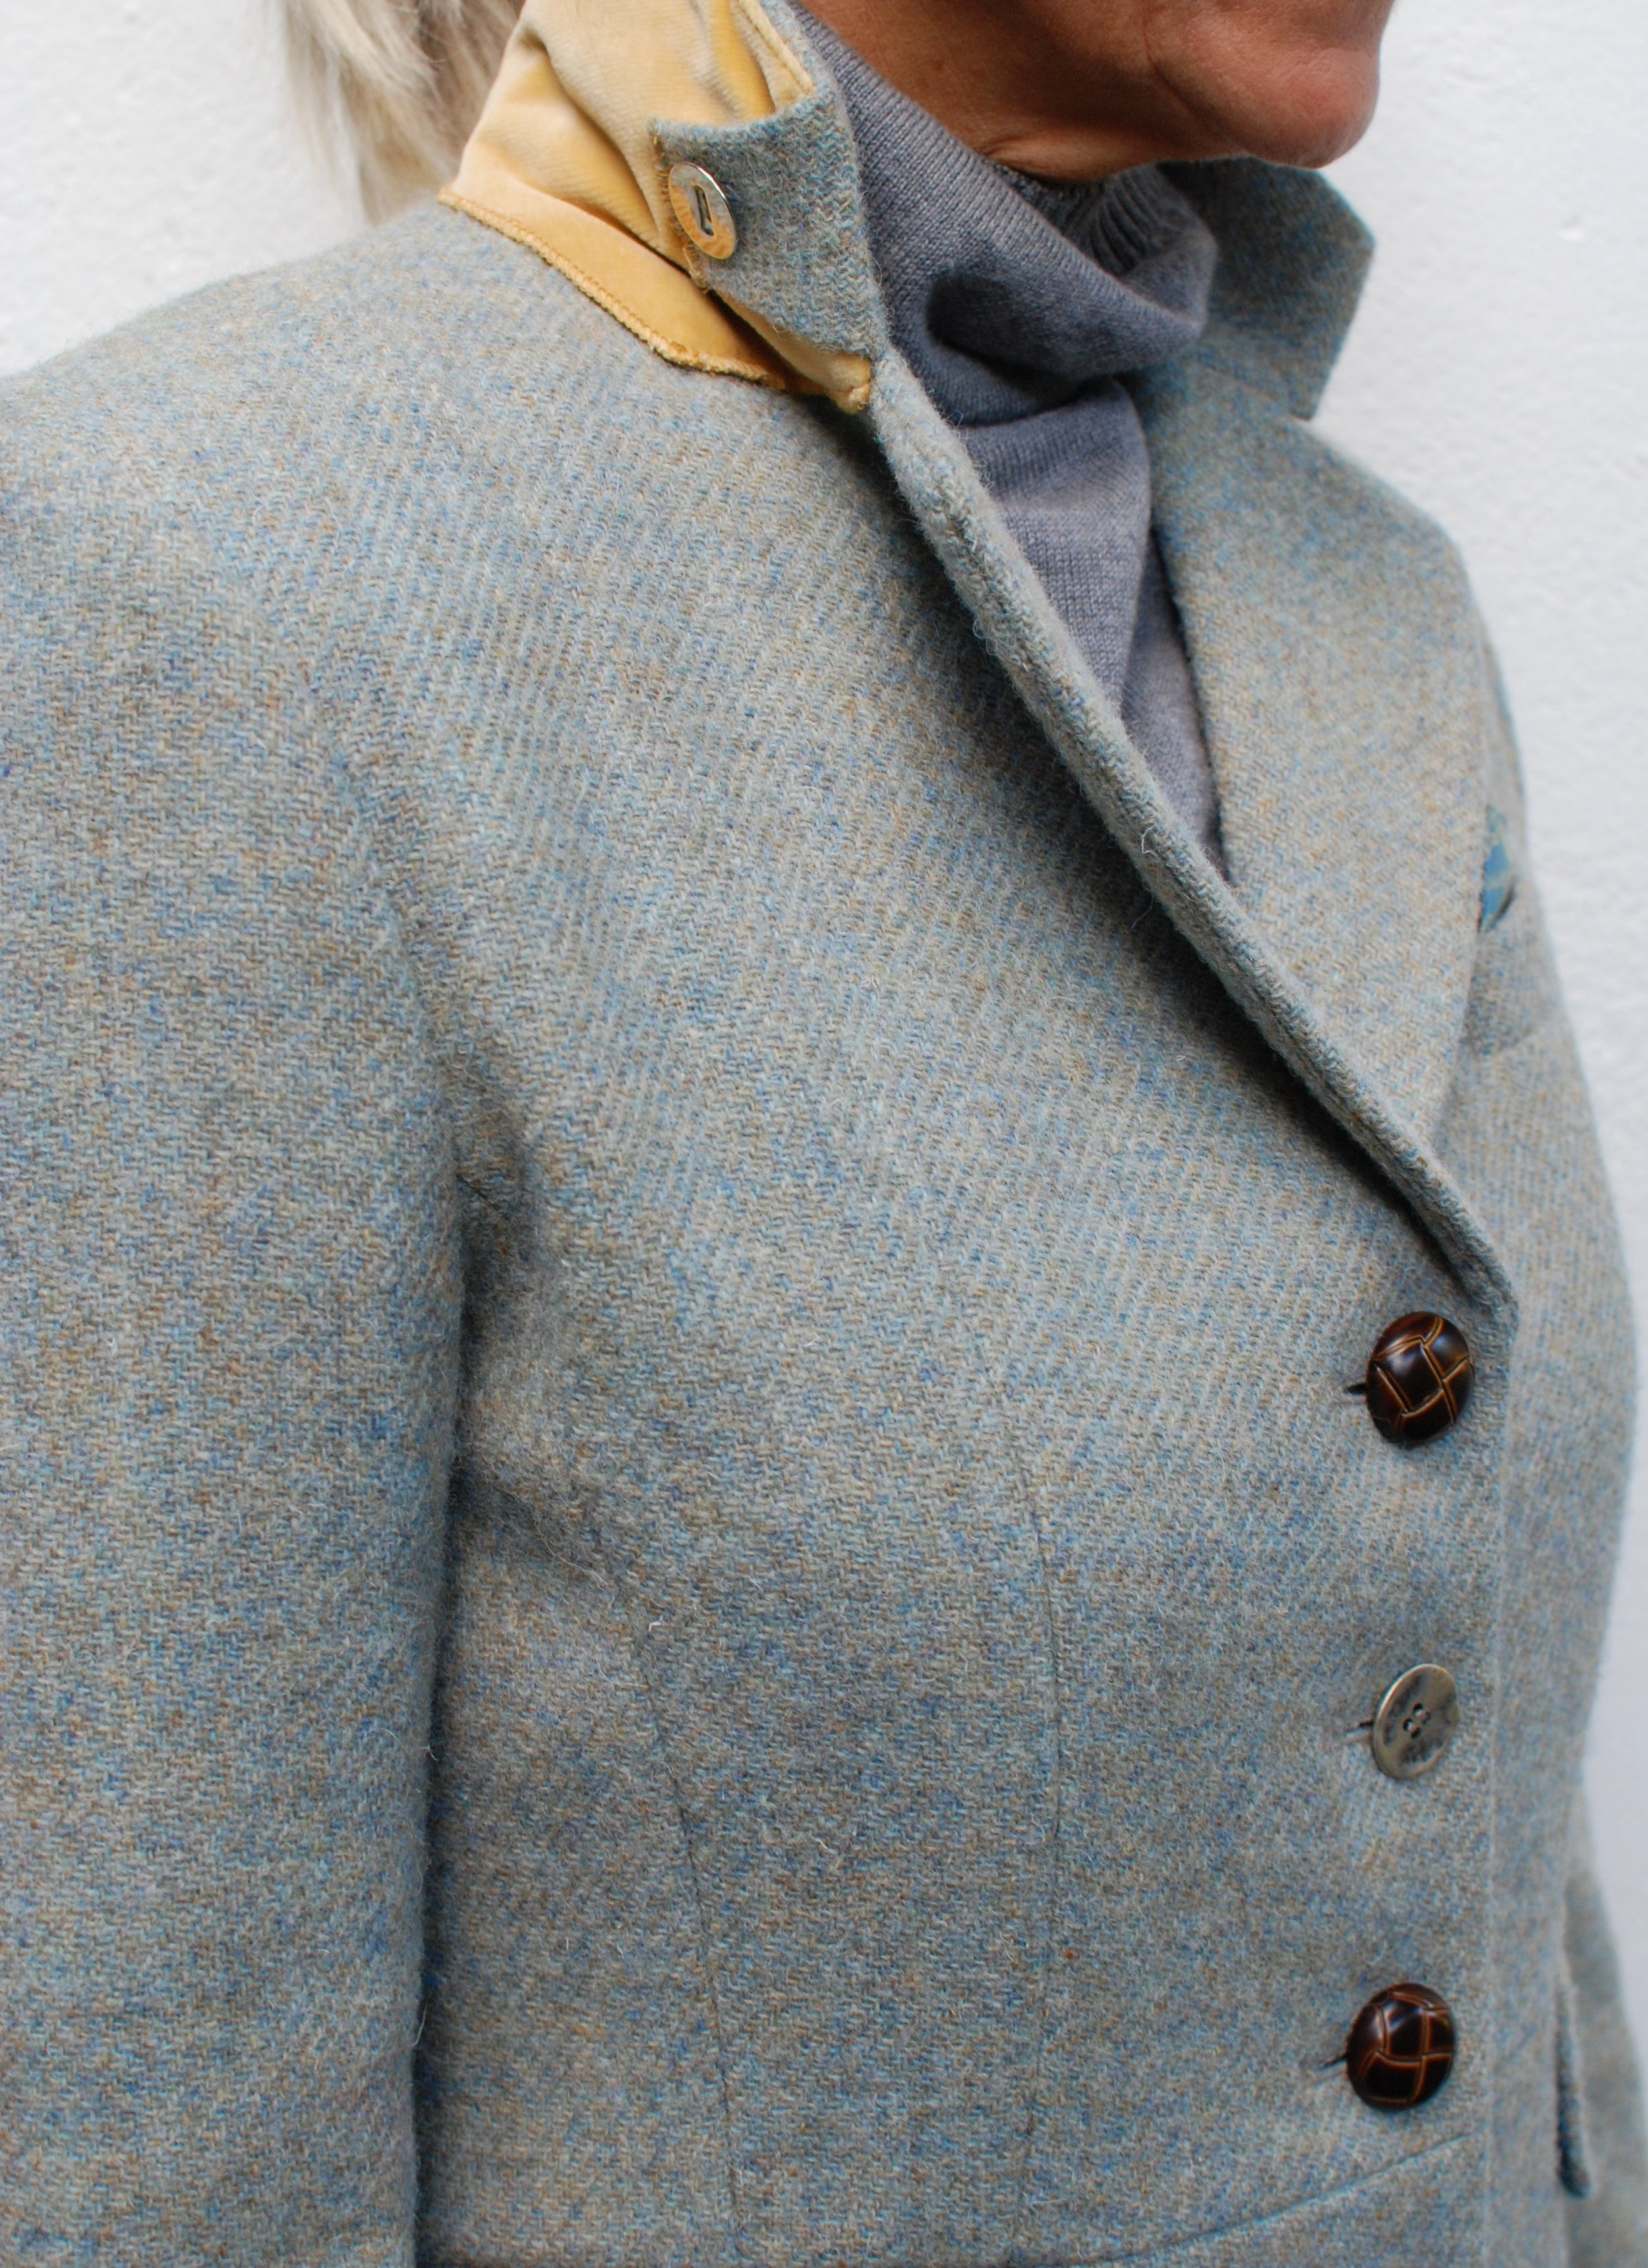 Stokey Tweed Jacket